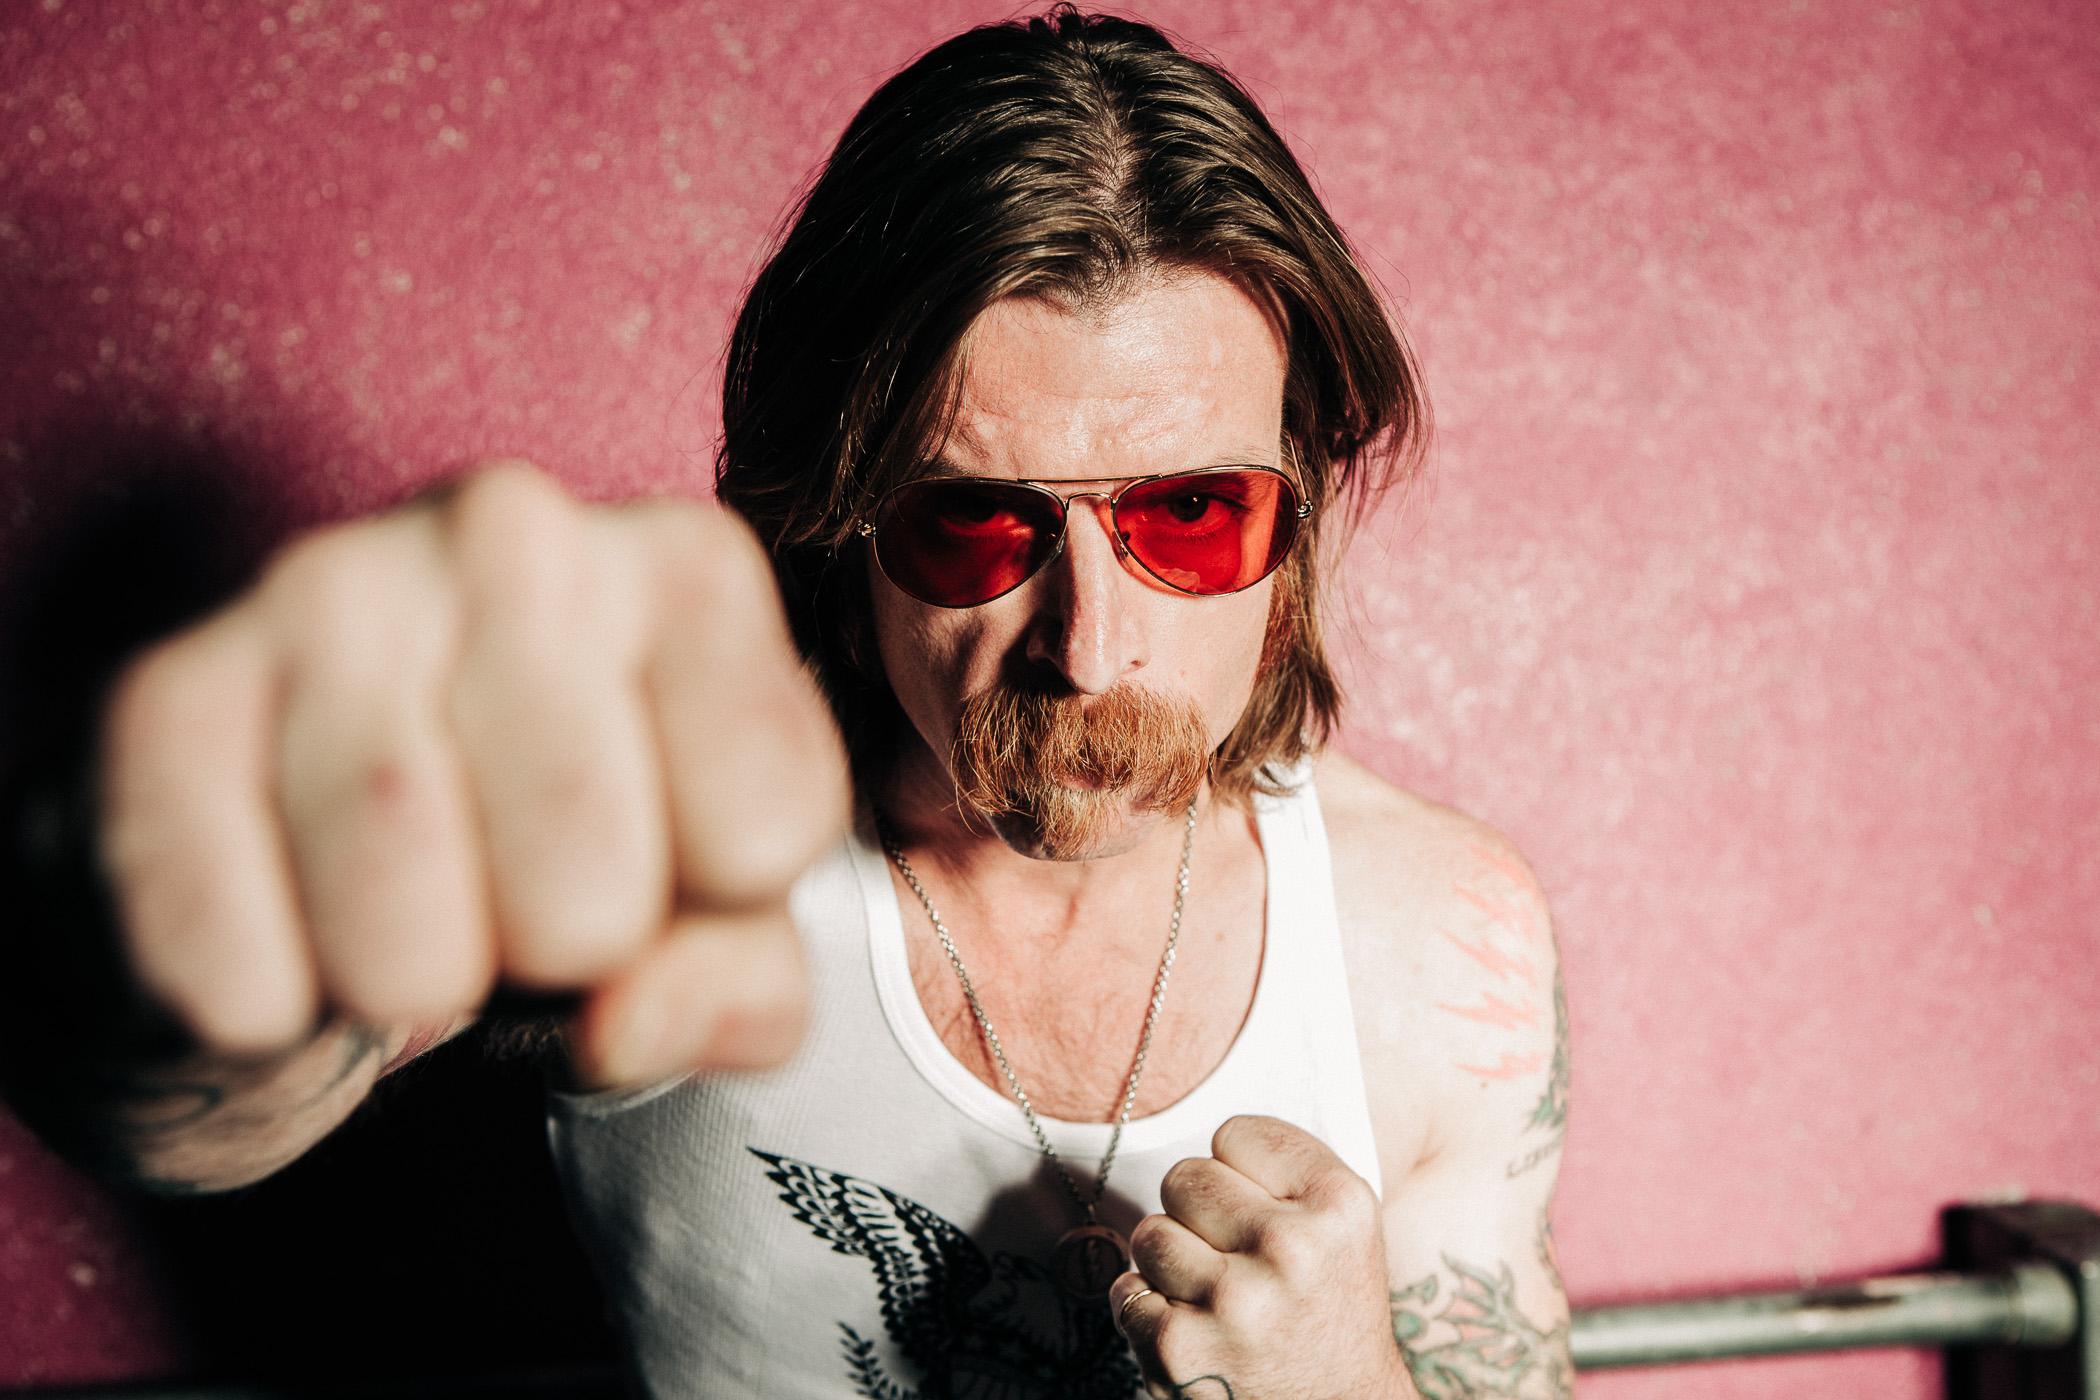 Jesse Hughes, eagles of death metal, Florian Kresse, Photograph, portrait, magazine, peoplefotografie, rockstar, Schlachthof Wiesbaden